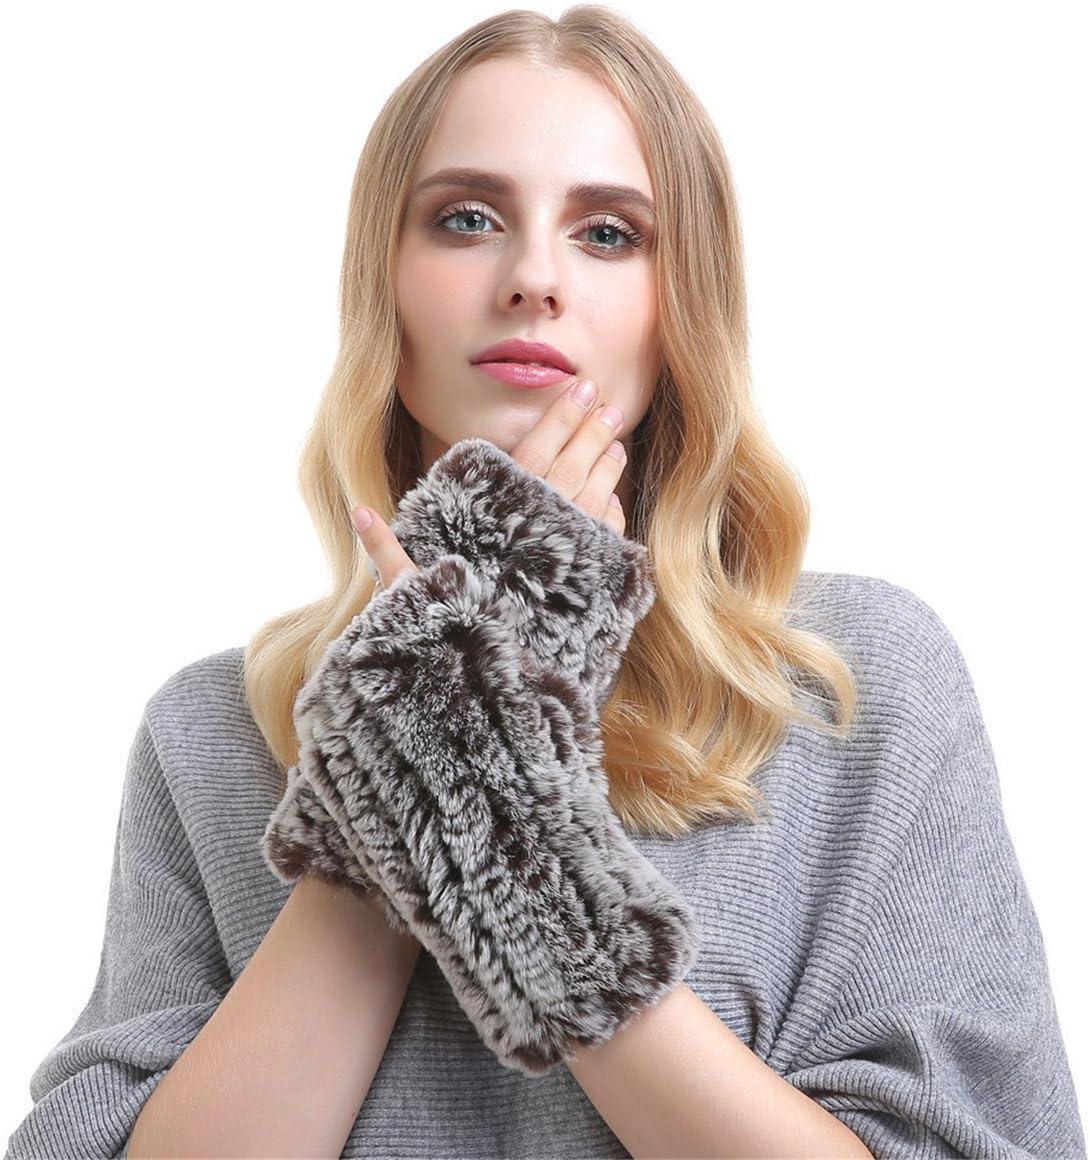 Qhome Women's Touchscreen Short Fingerless Cony Hair Knitted Gloves Warm Elastic Woven Wristbands